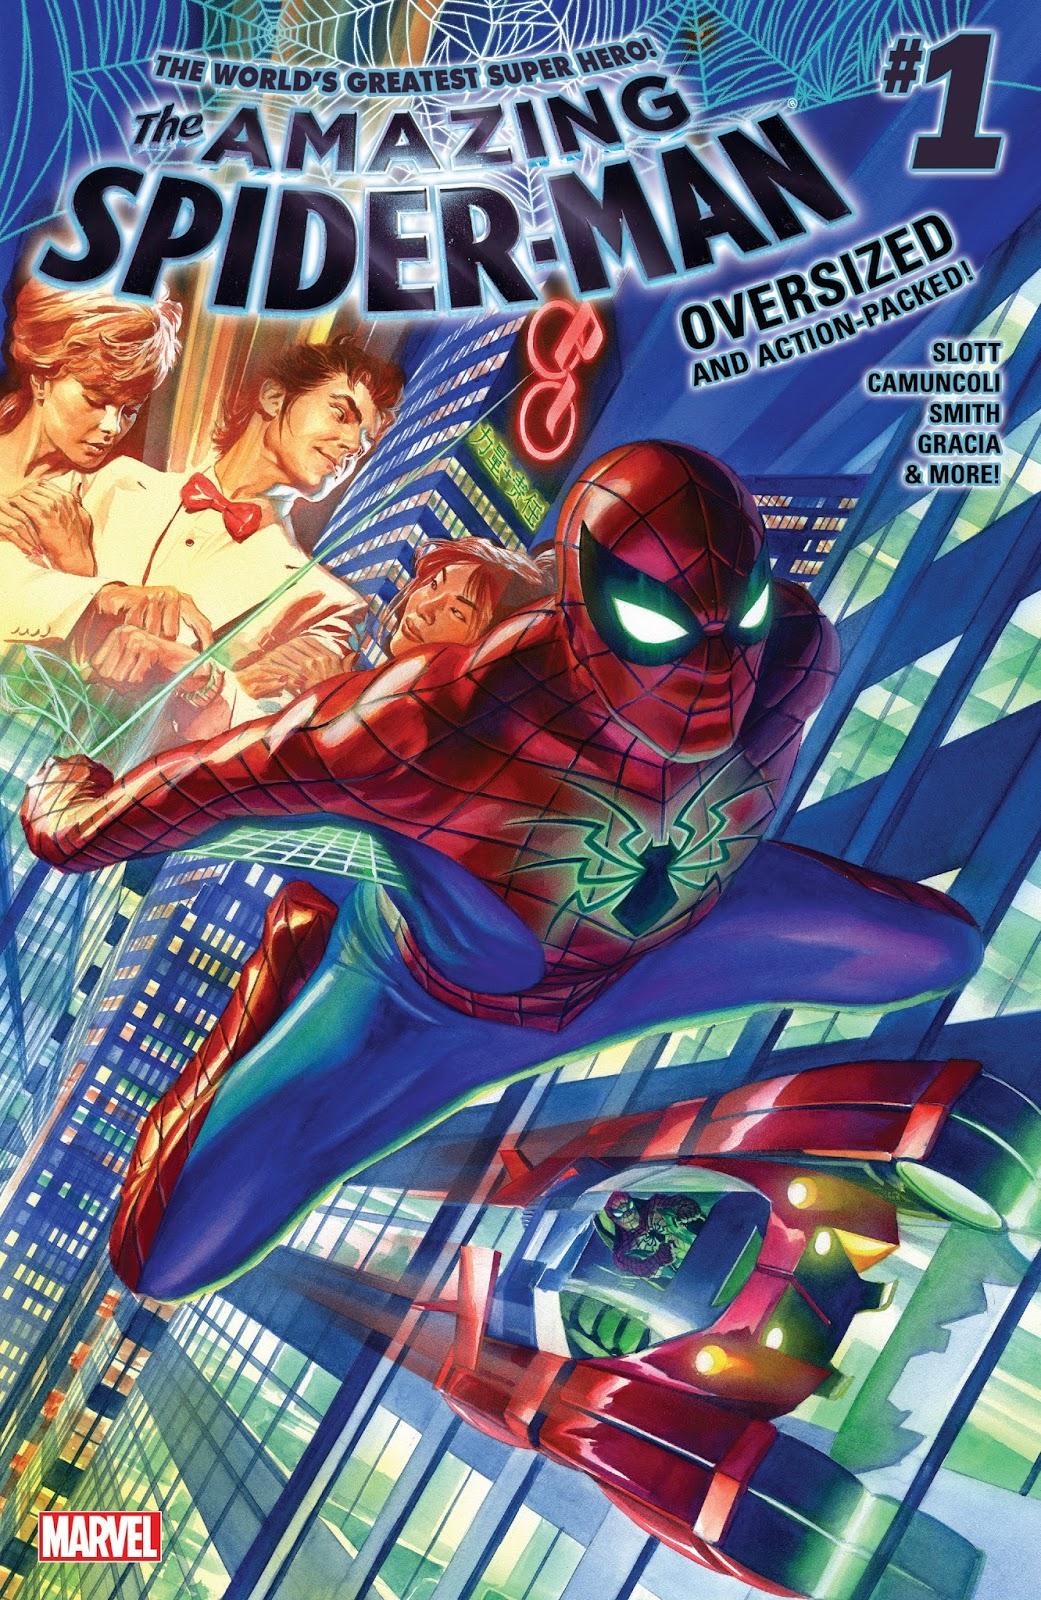 Descargar e Instalar The Amazing Spiderman Para PC FULL ESPAÑOL 2017!!